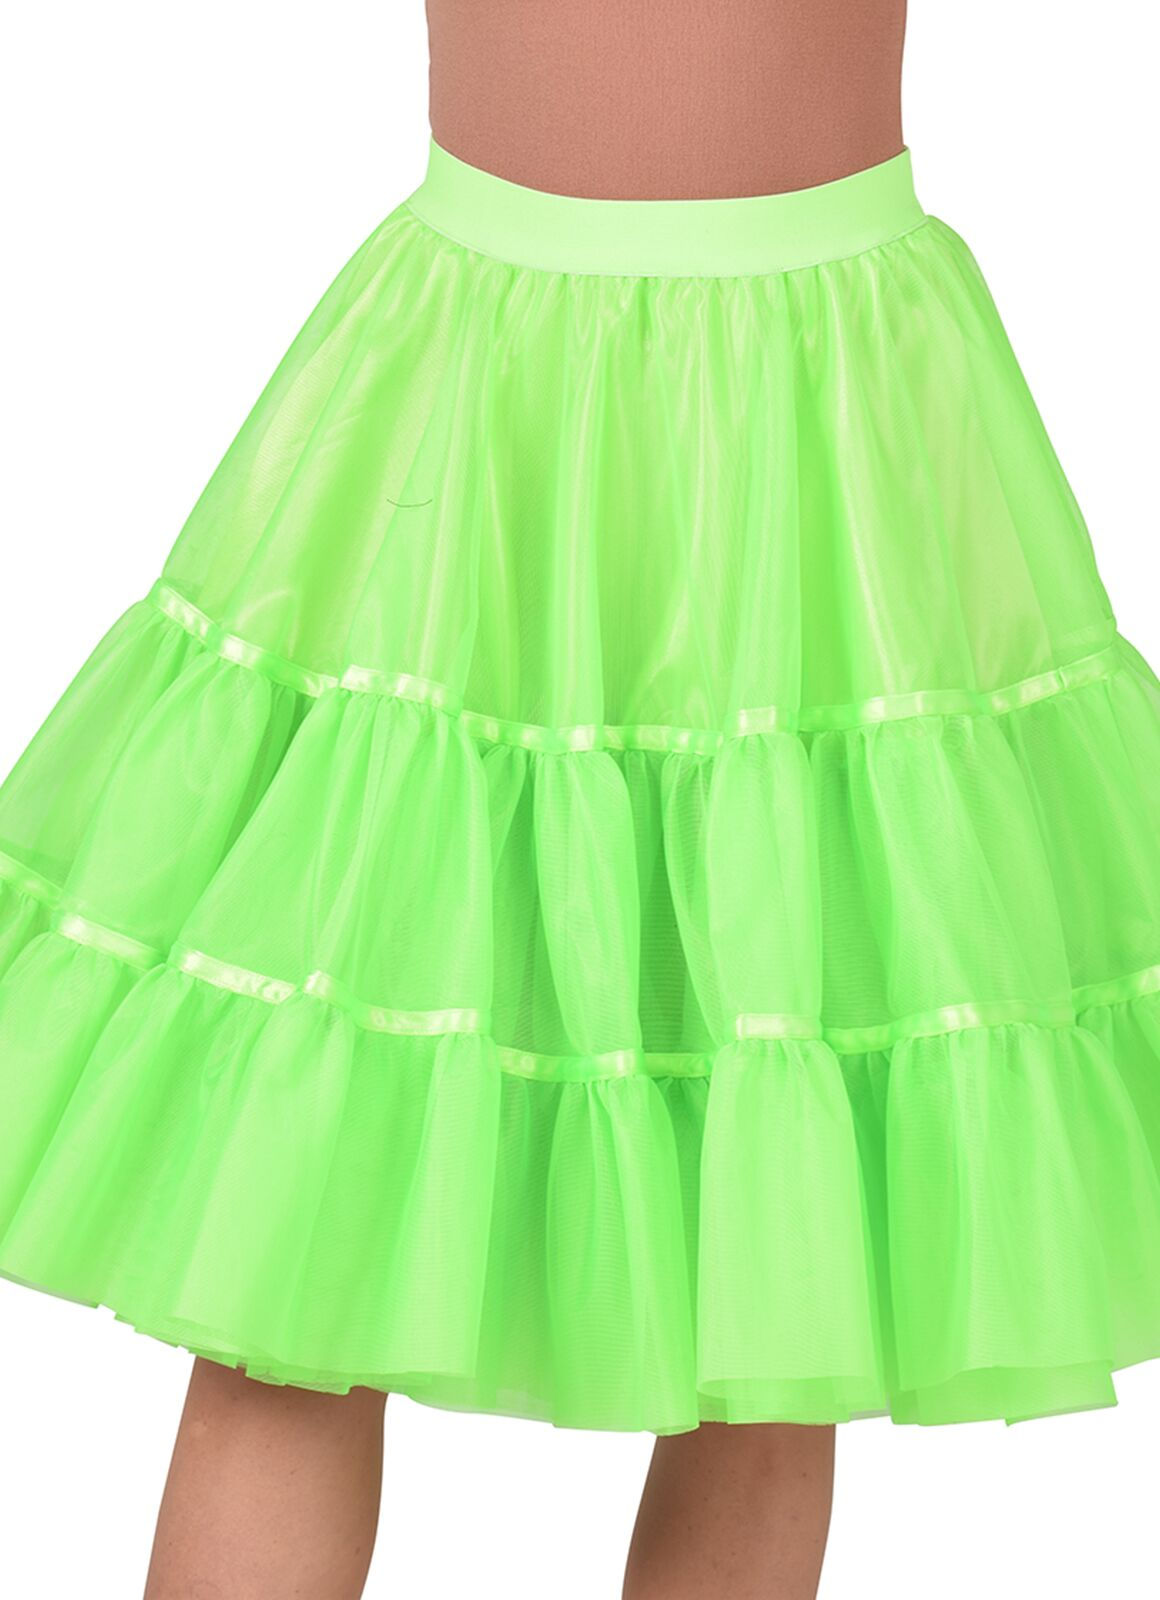 Groene petticoat middel lang vrouwen